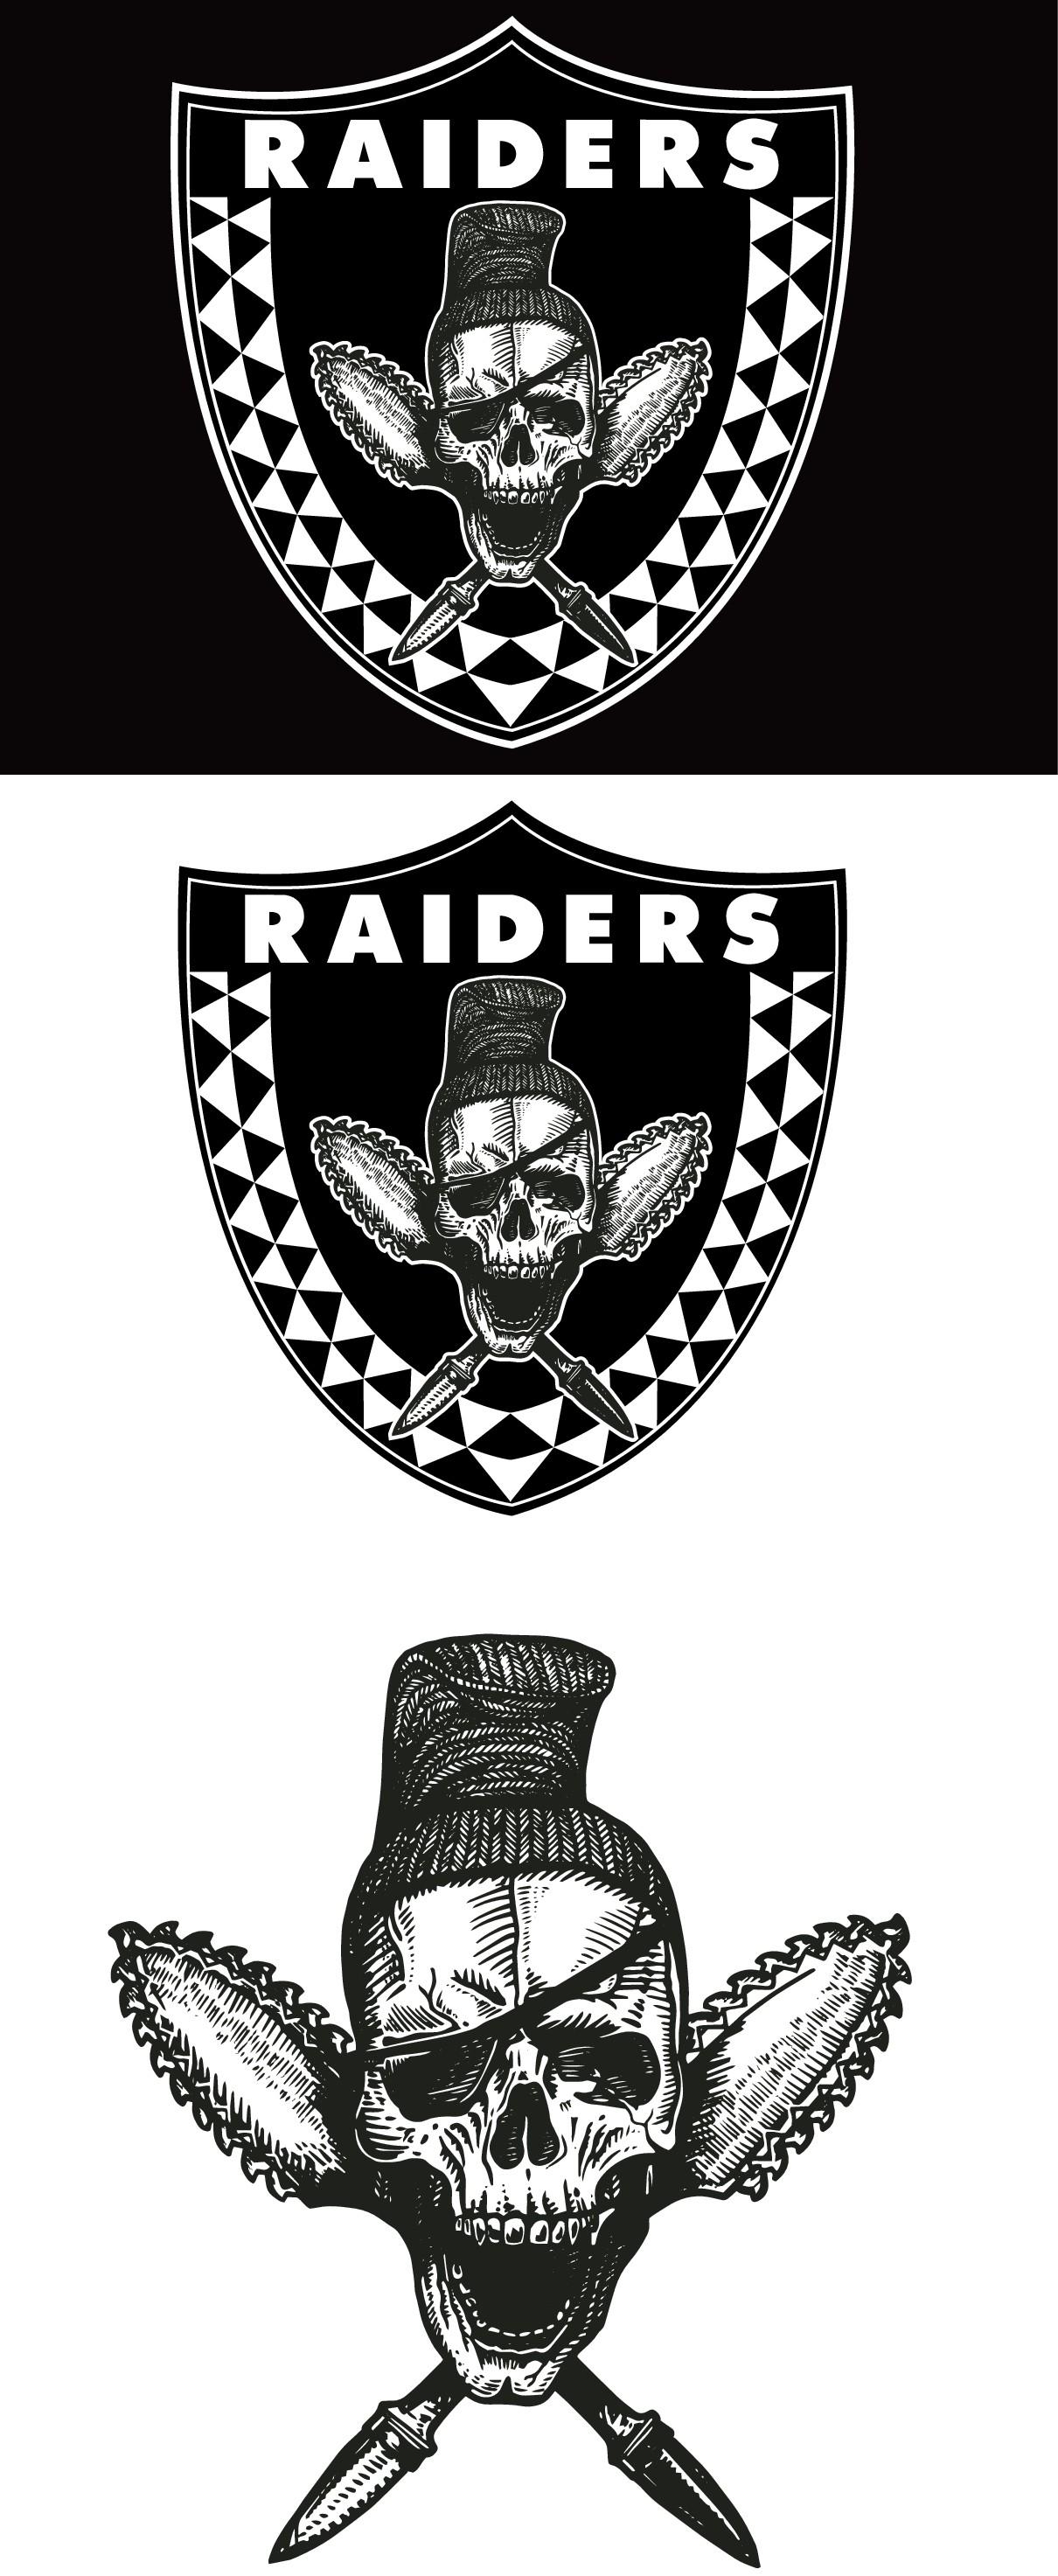 Hawaii fighters-raiders logo